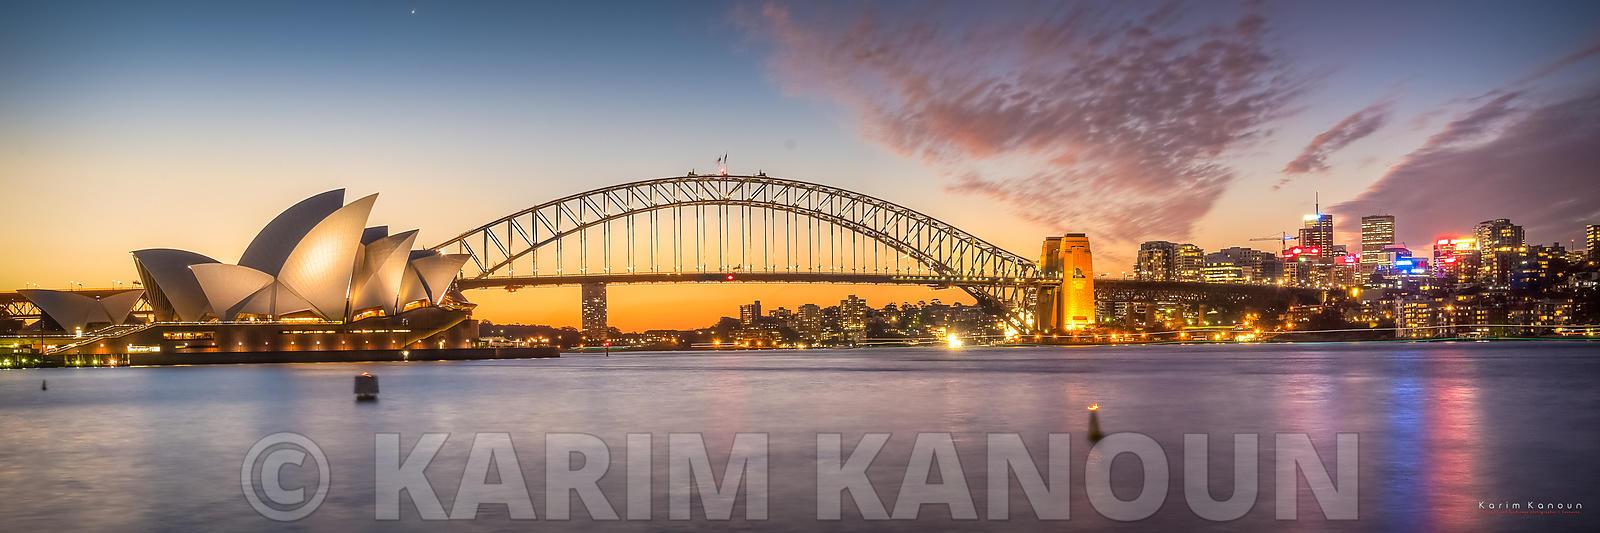 Panorama - Sydney Opera House with pinkish tint sunset